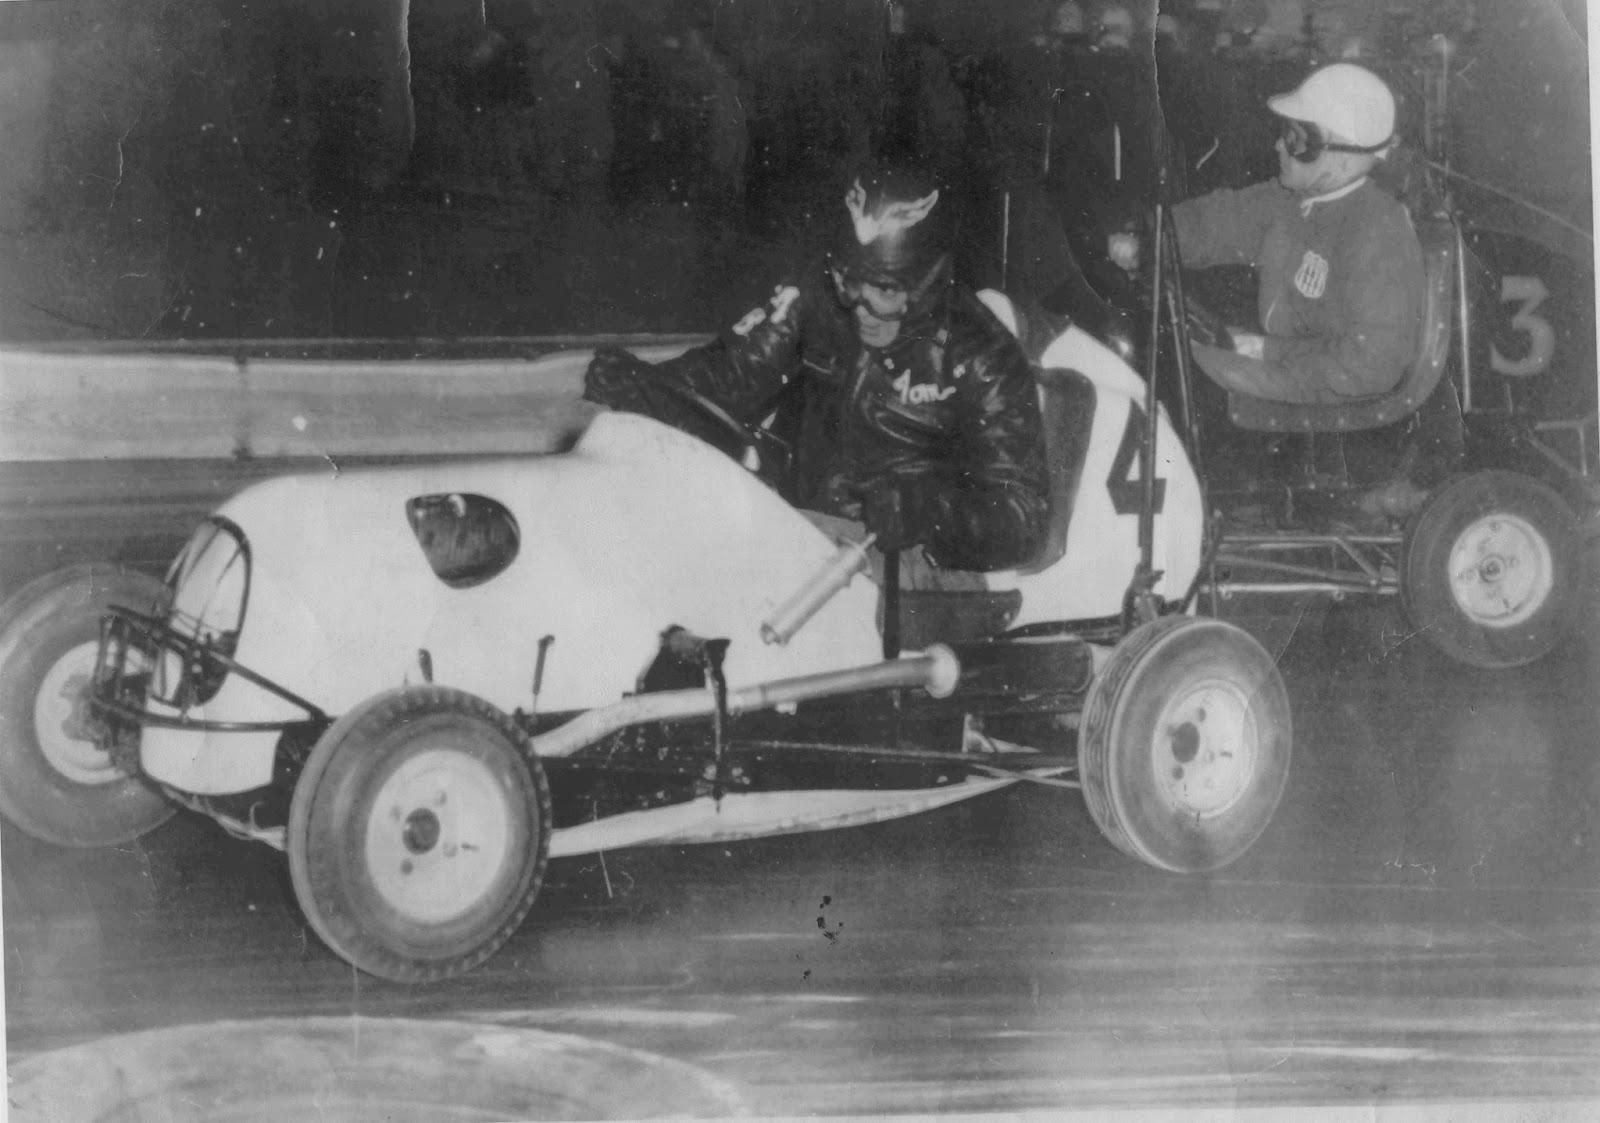 Harley davidson midget race car, adult amateur voyeur